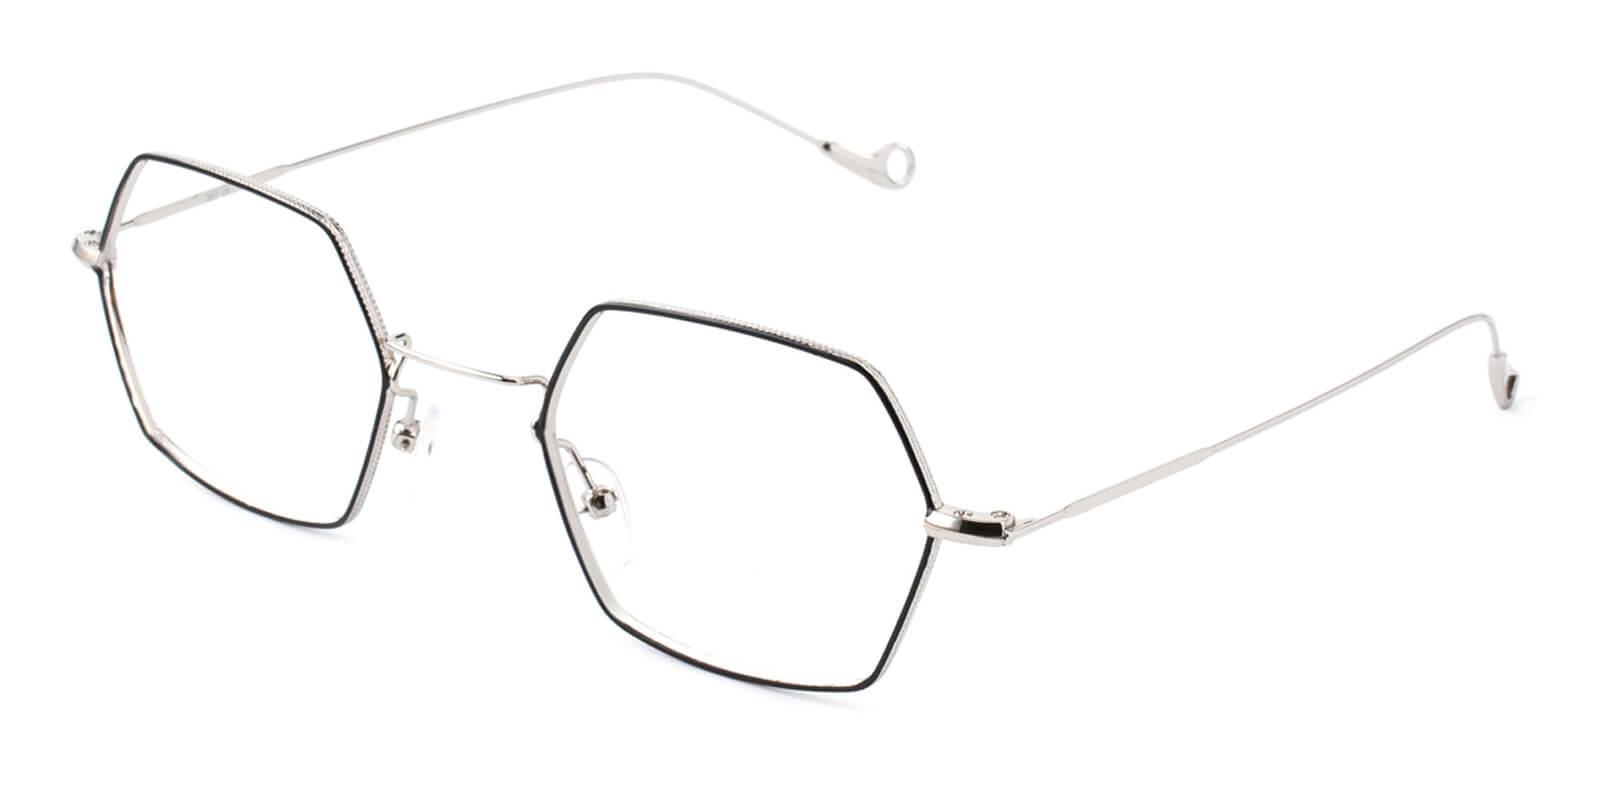 Goldien-Multicolor-Geometric-Metal-Eyeglasses-additional1